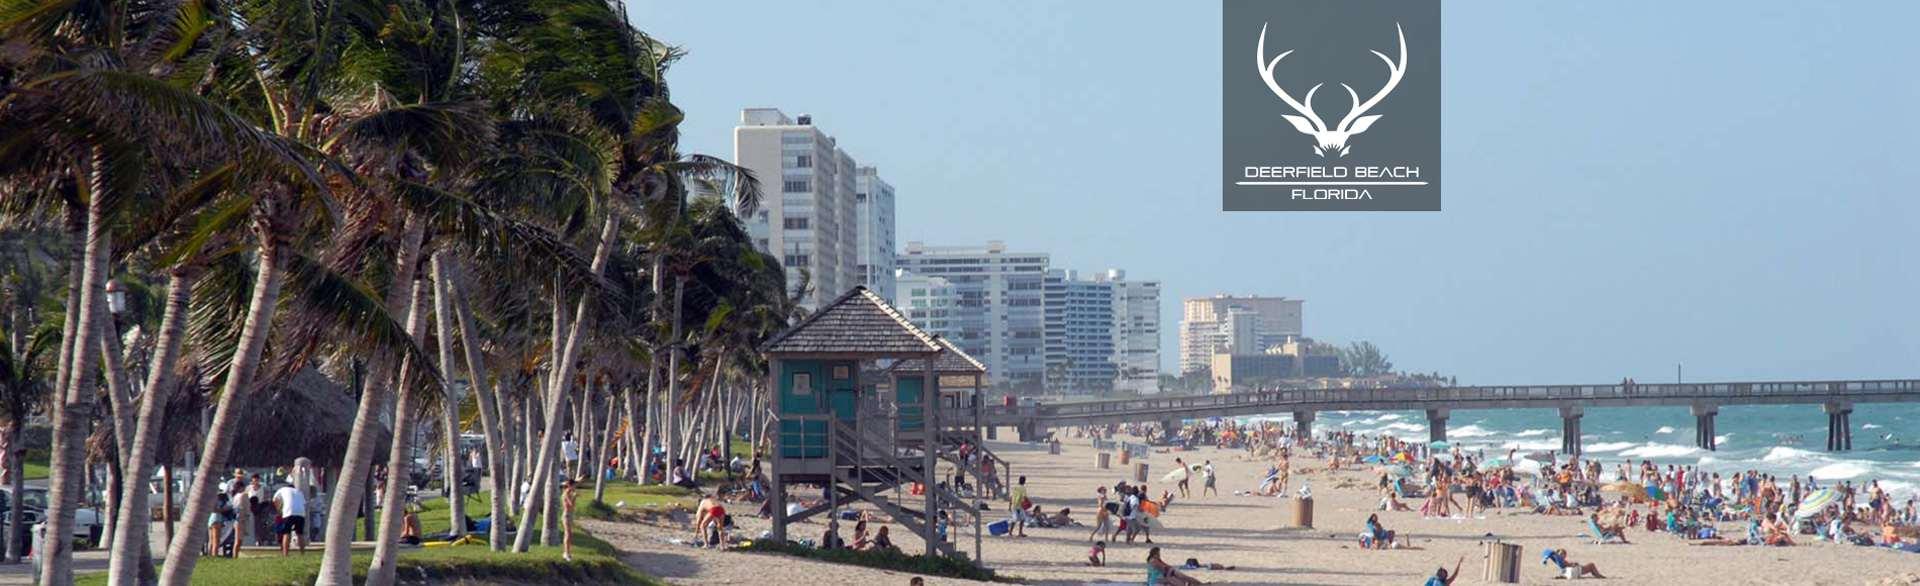 sliders_public_beaches_deerfield